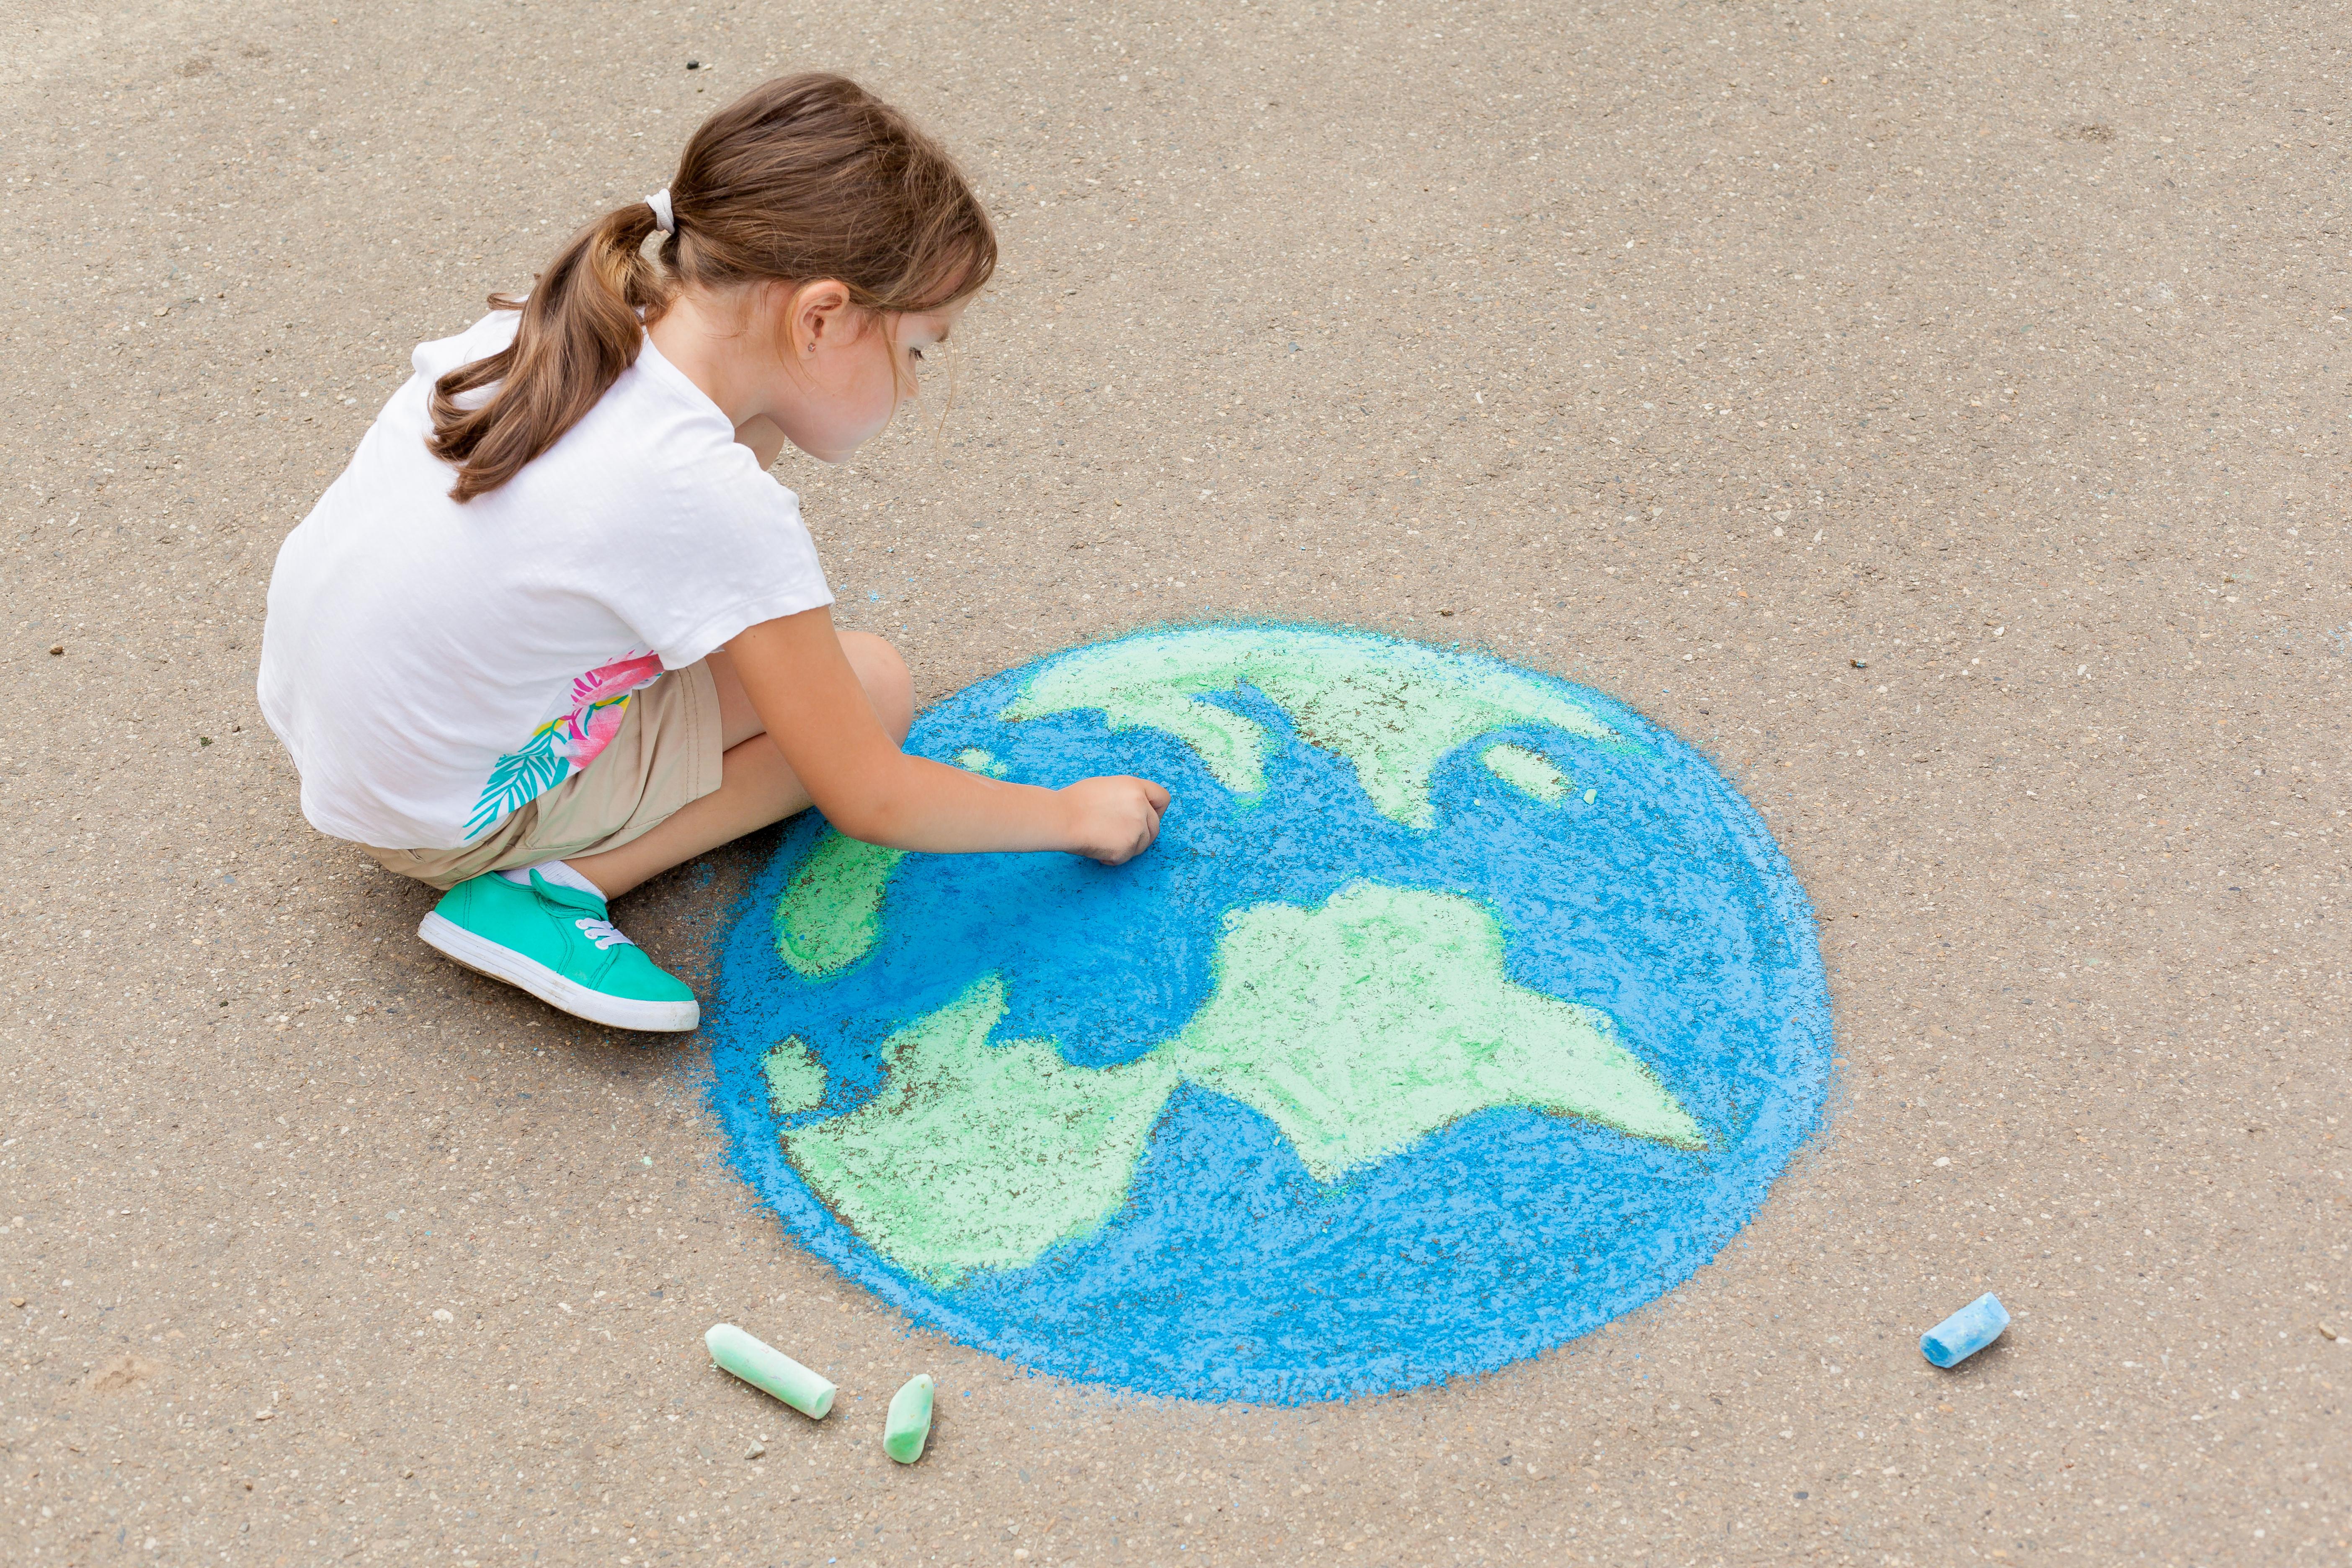 Girl draws the Earth using chalk